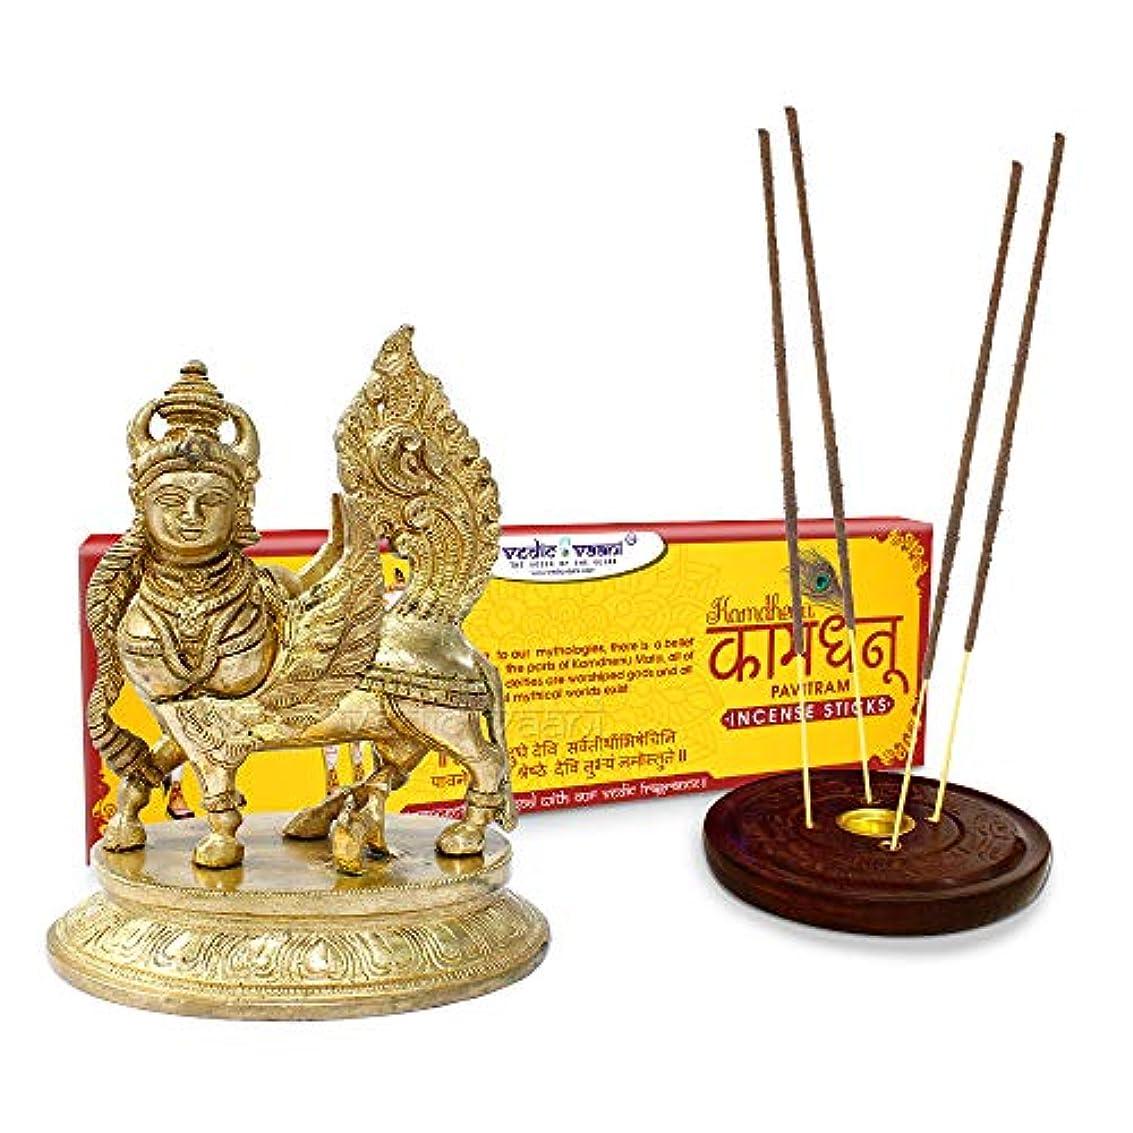 Vedic Vaani Kamdhenu Idol 真鍮製 Kamdhenu お香スティック